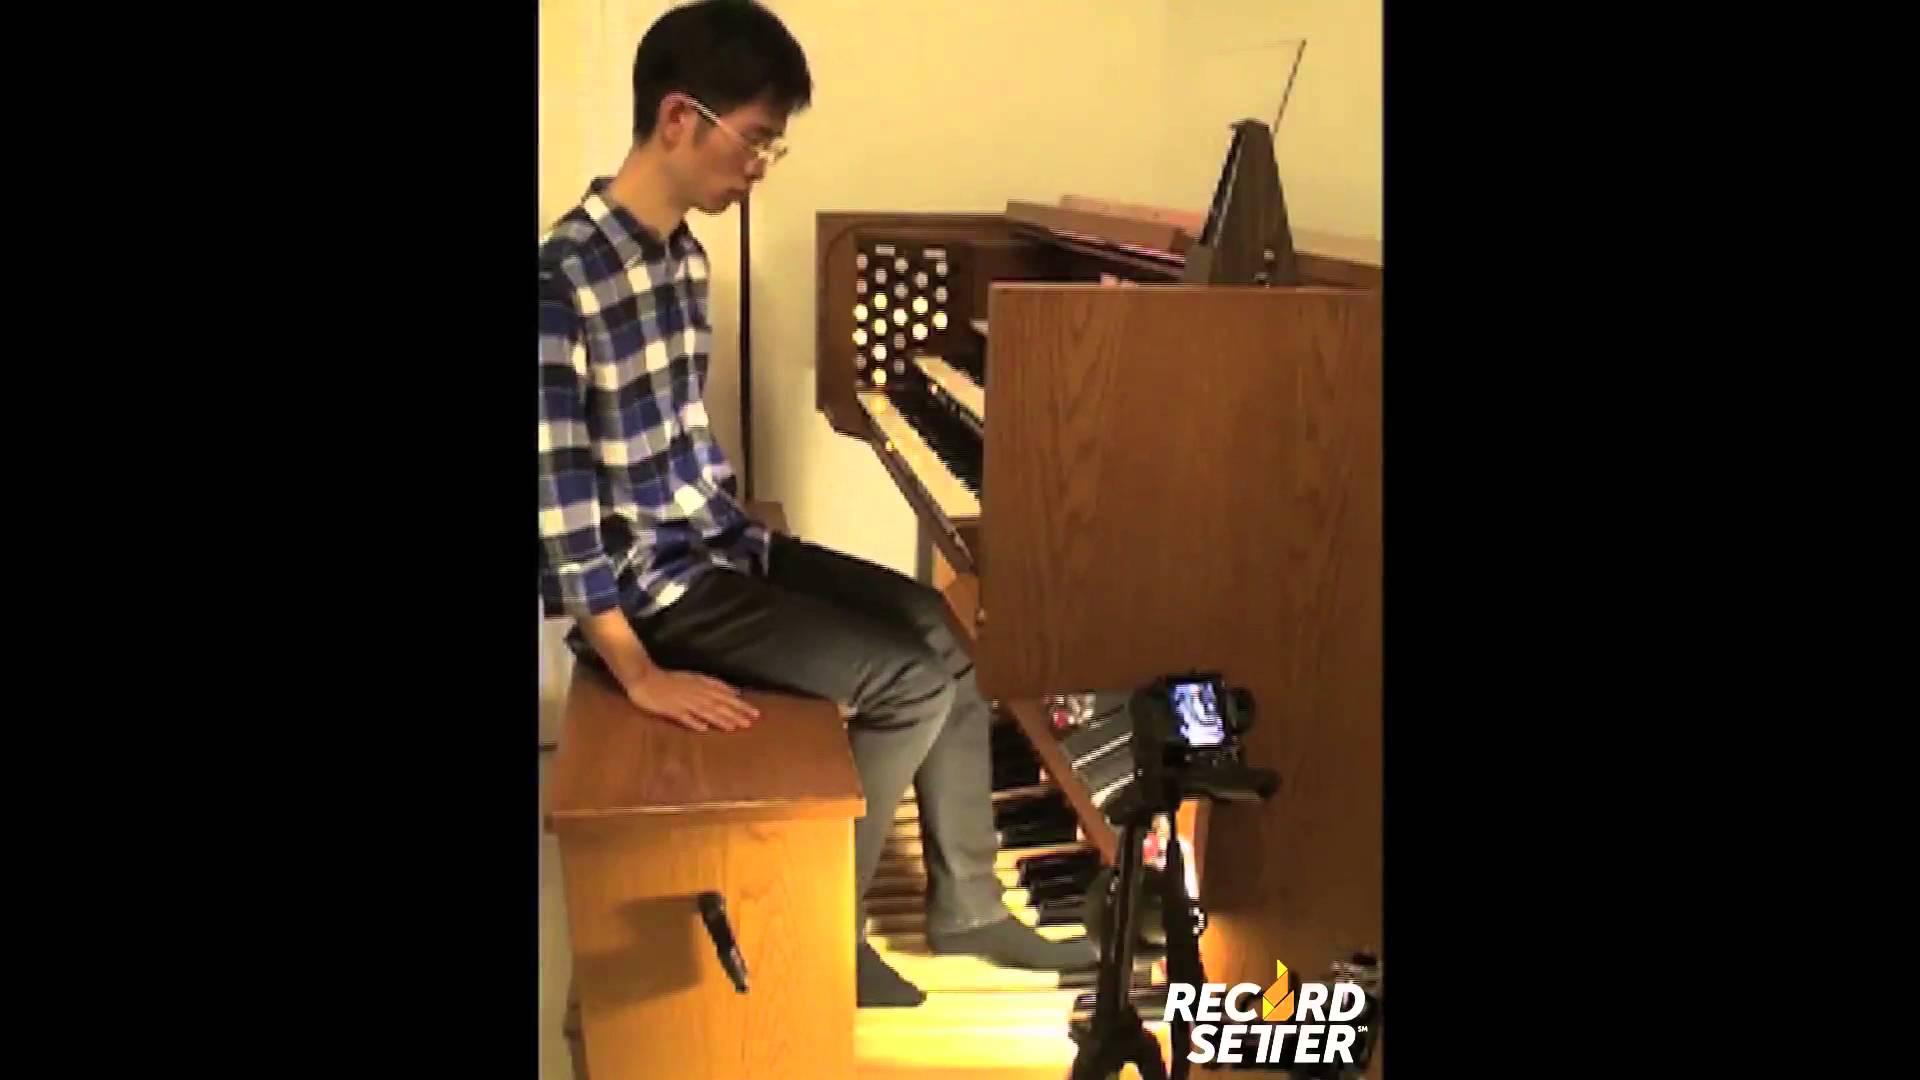 Hong kong musician sets world record for playing a